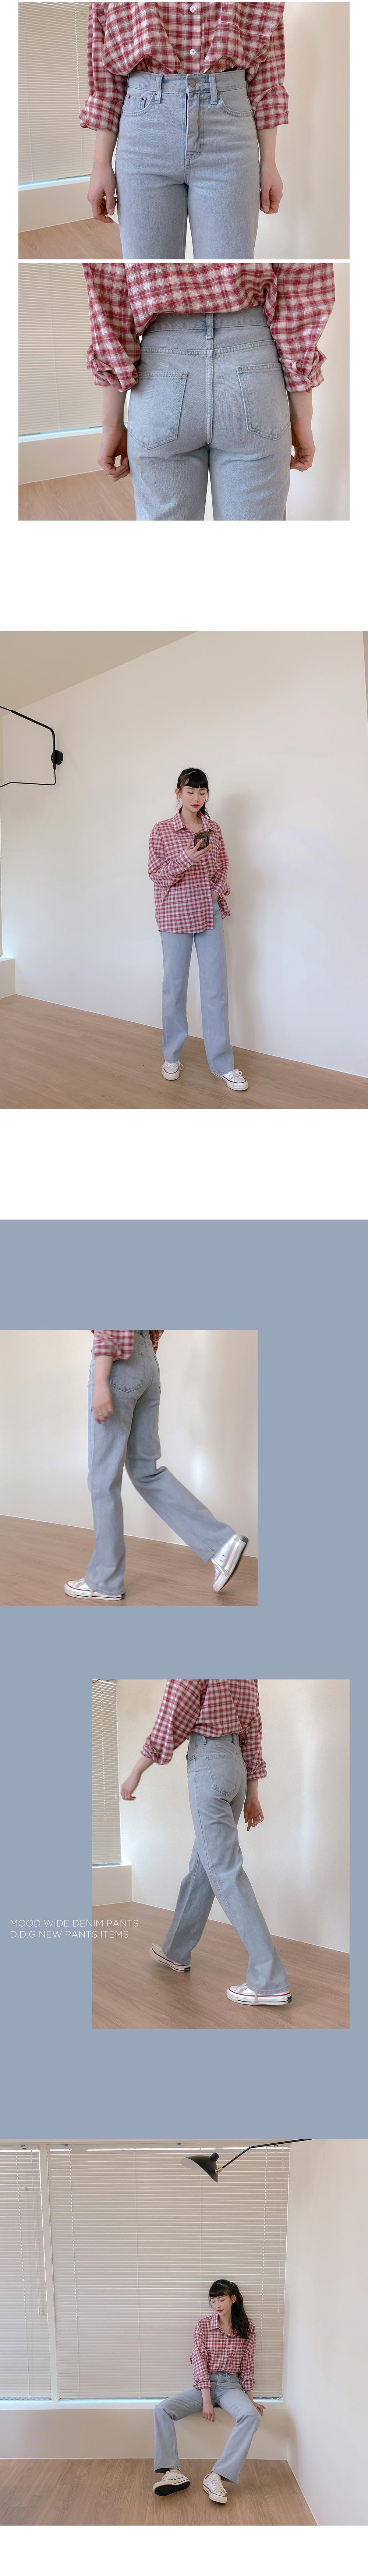 Big Size 26-38 Inch Mood Wide Denim Pants